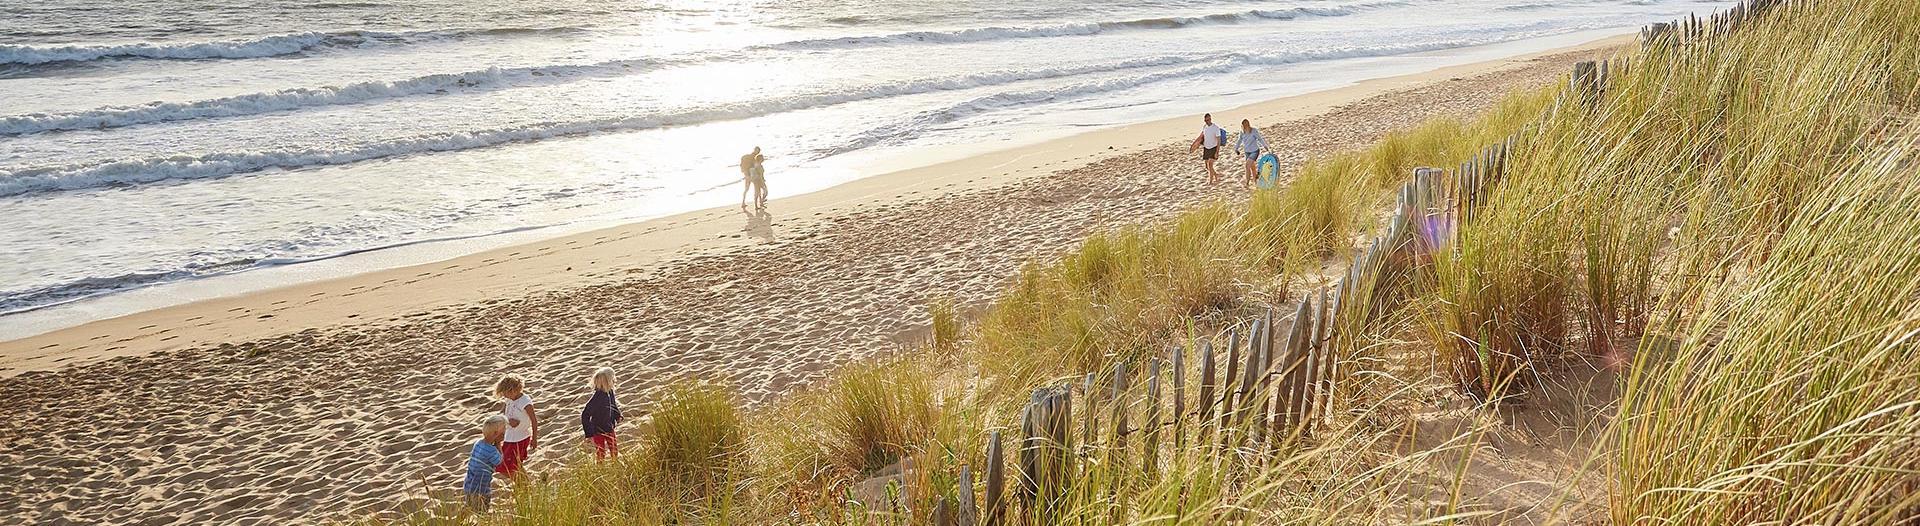 slider-camping-atlantique-vendee-plage-longeville-sur-mer